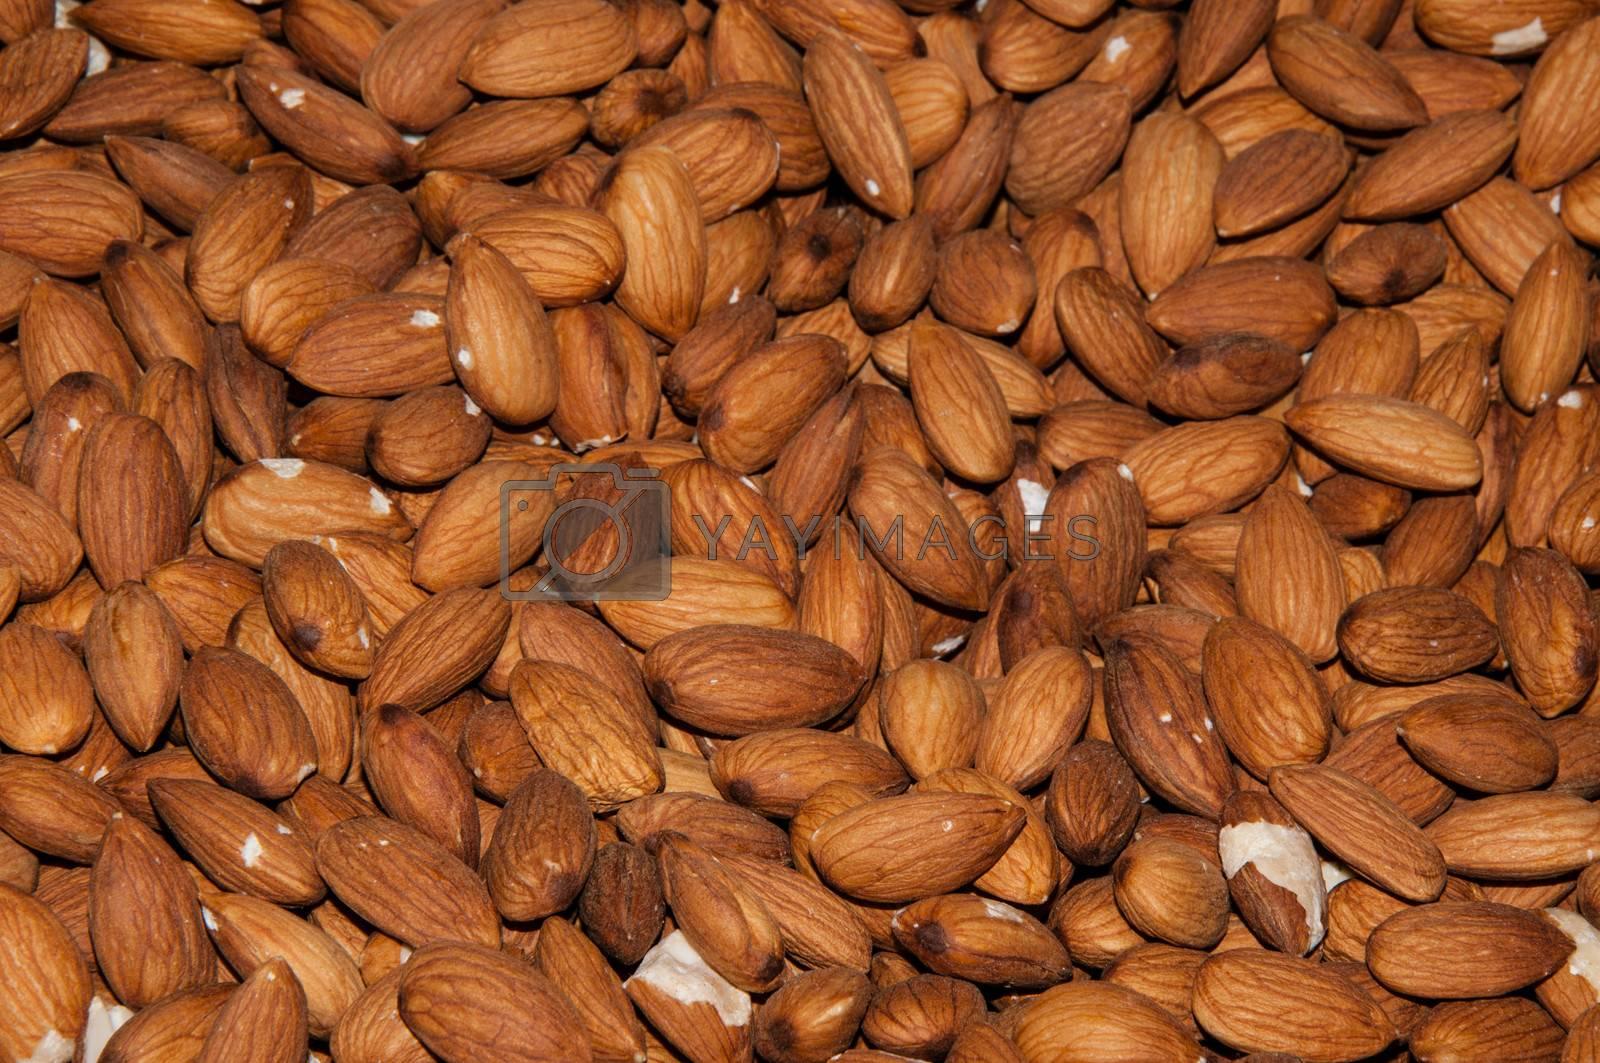 Fruit sweet Almond  by vladimirvasil